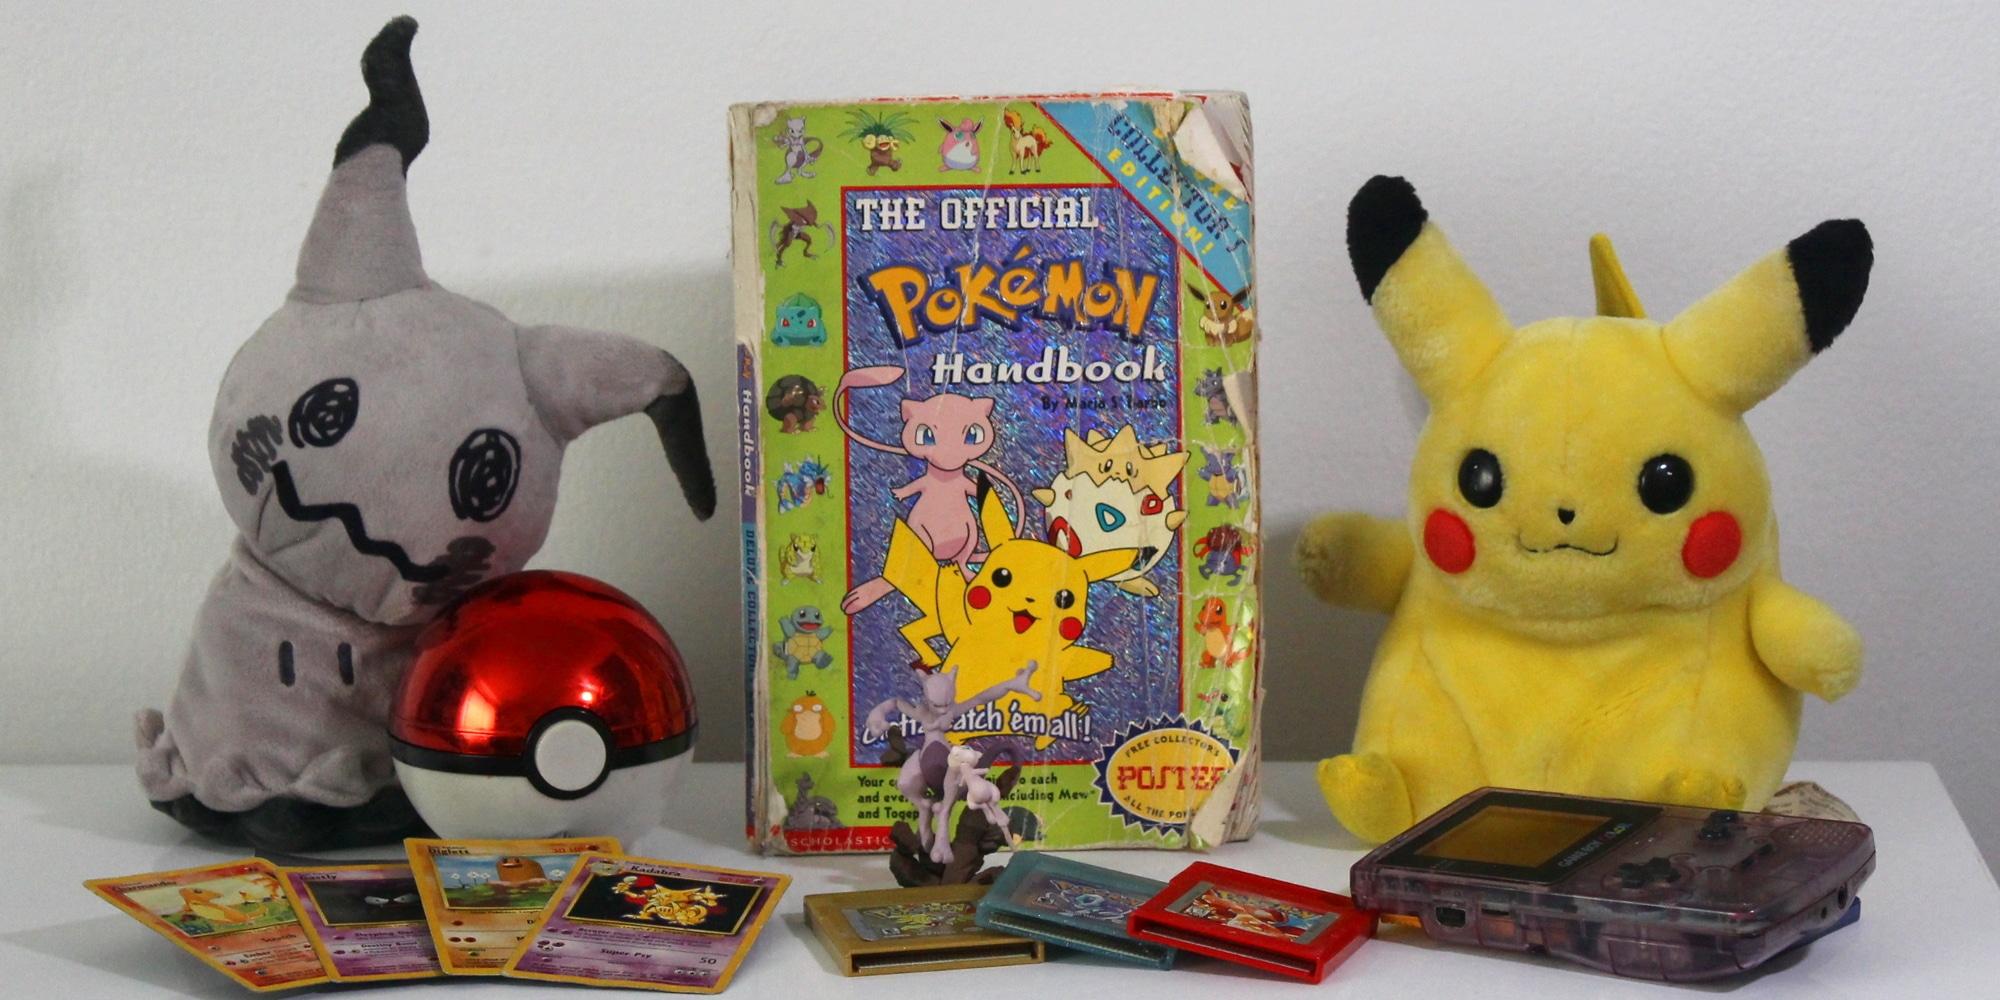 Memorabilia from throughout Pokémon history